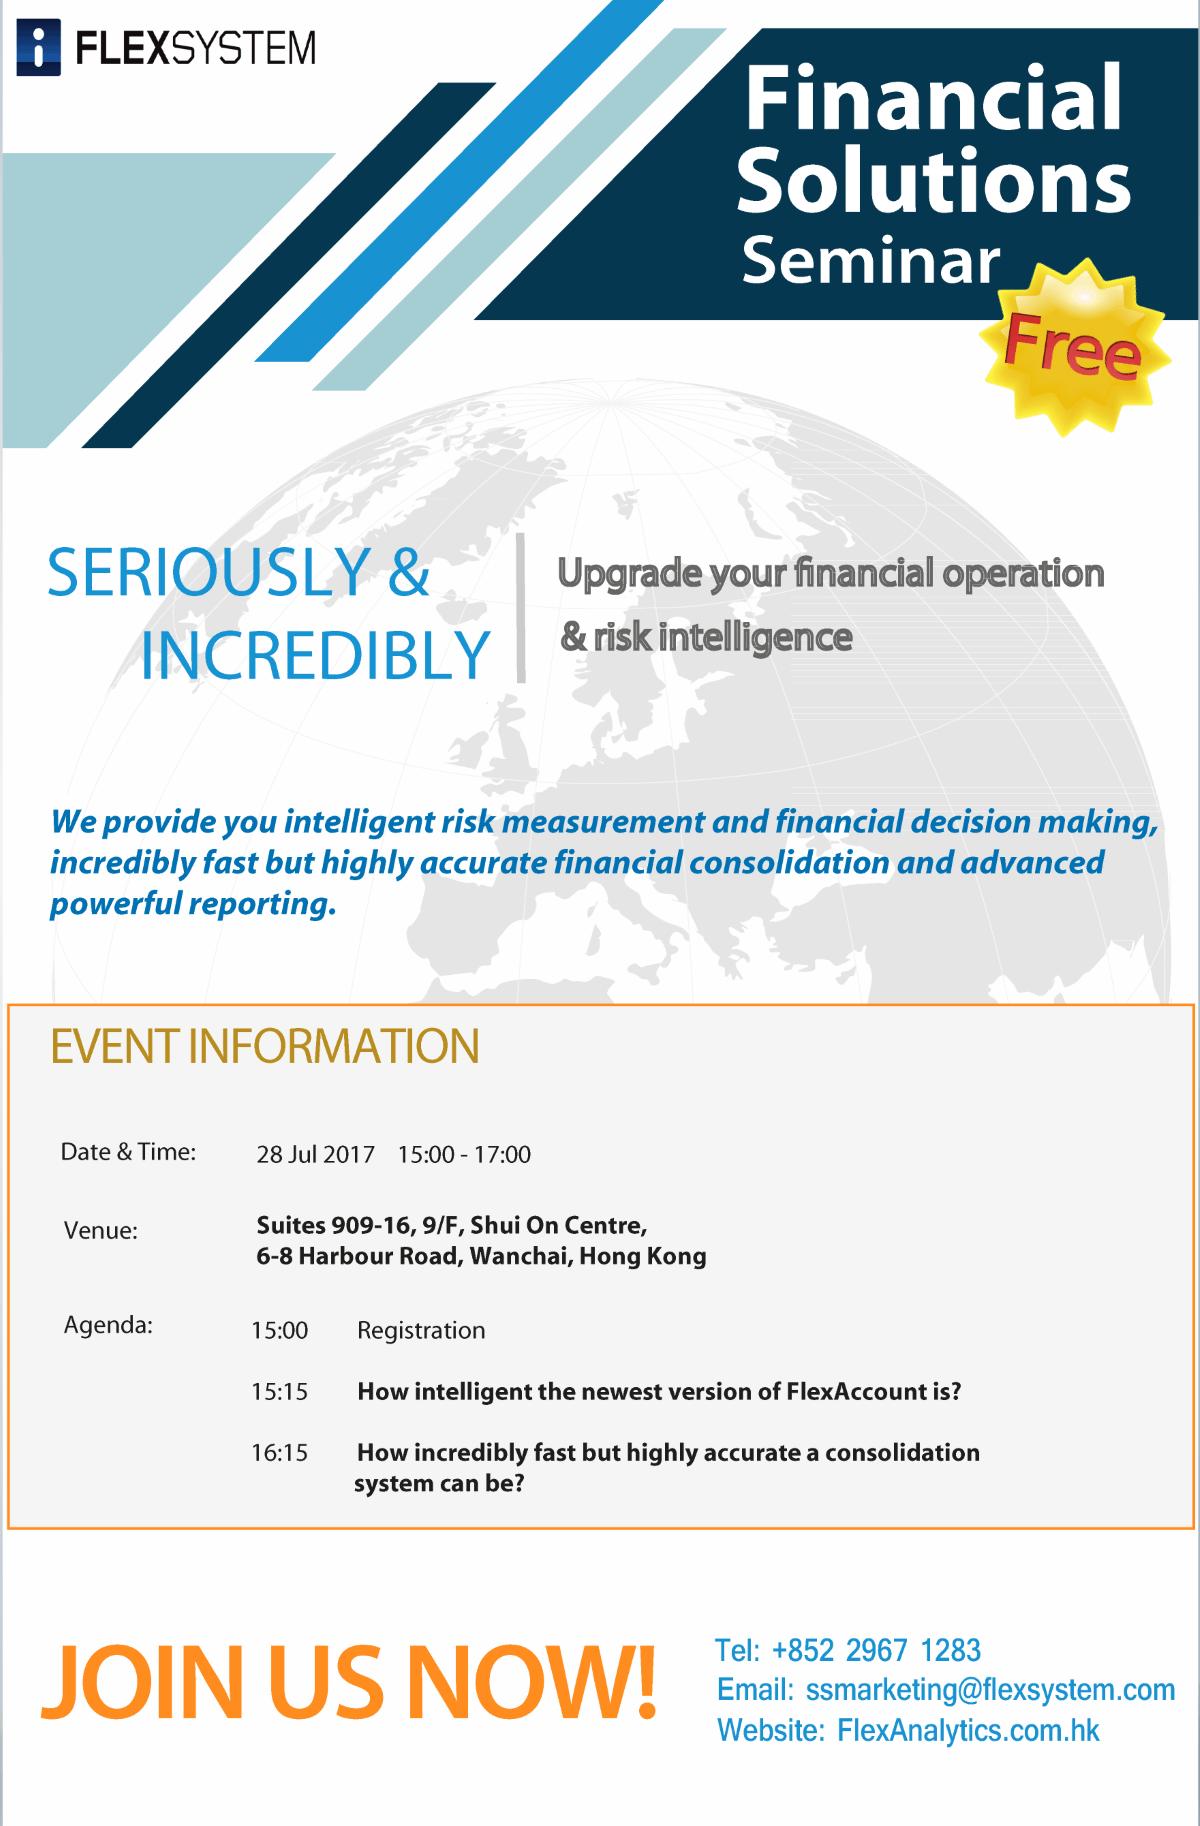 Financial Seminar info